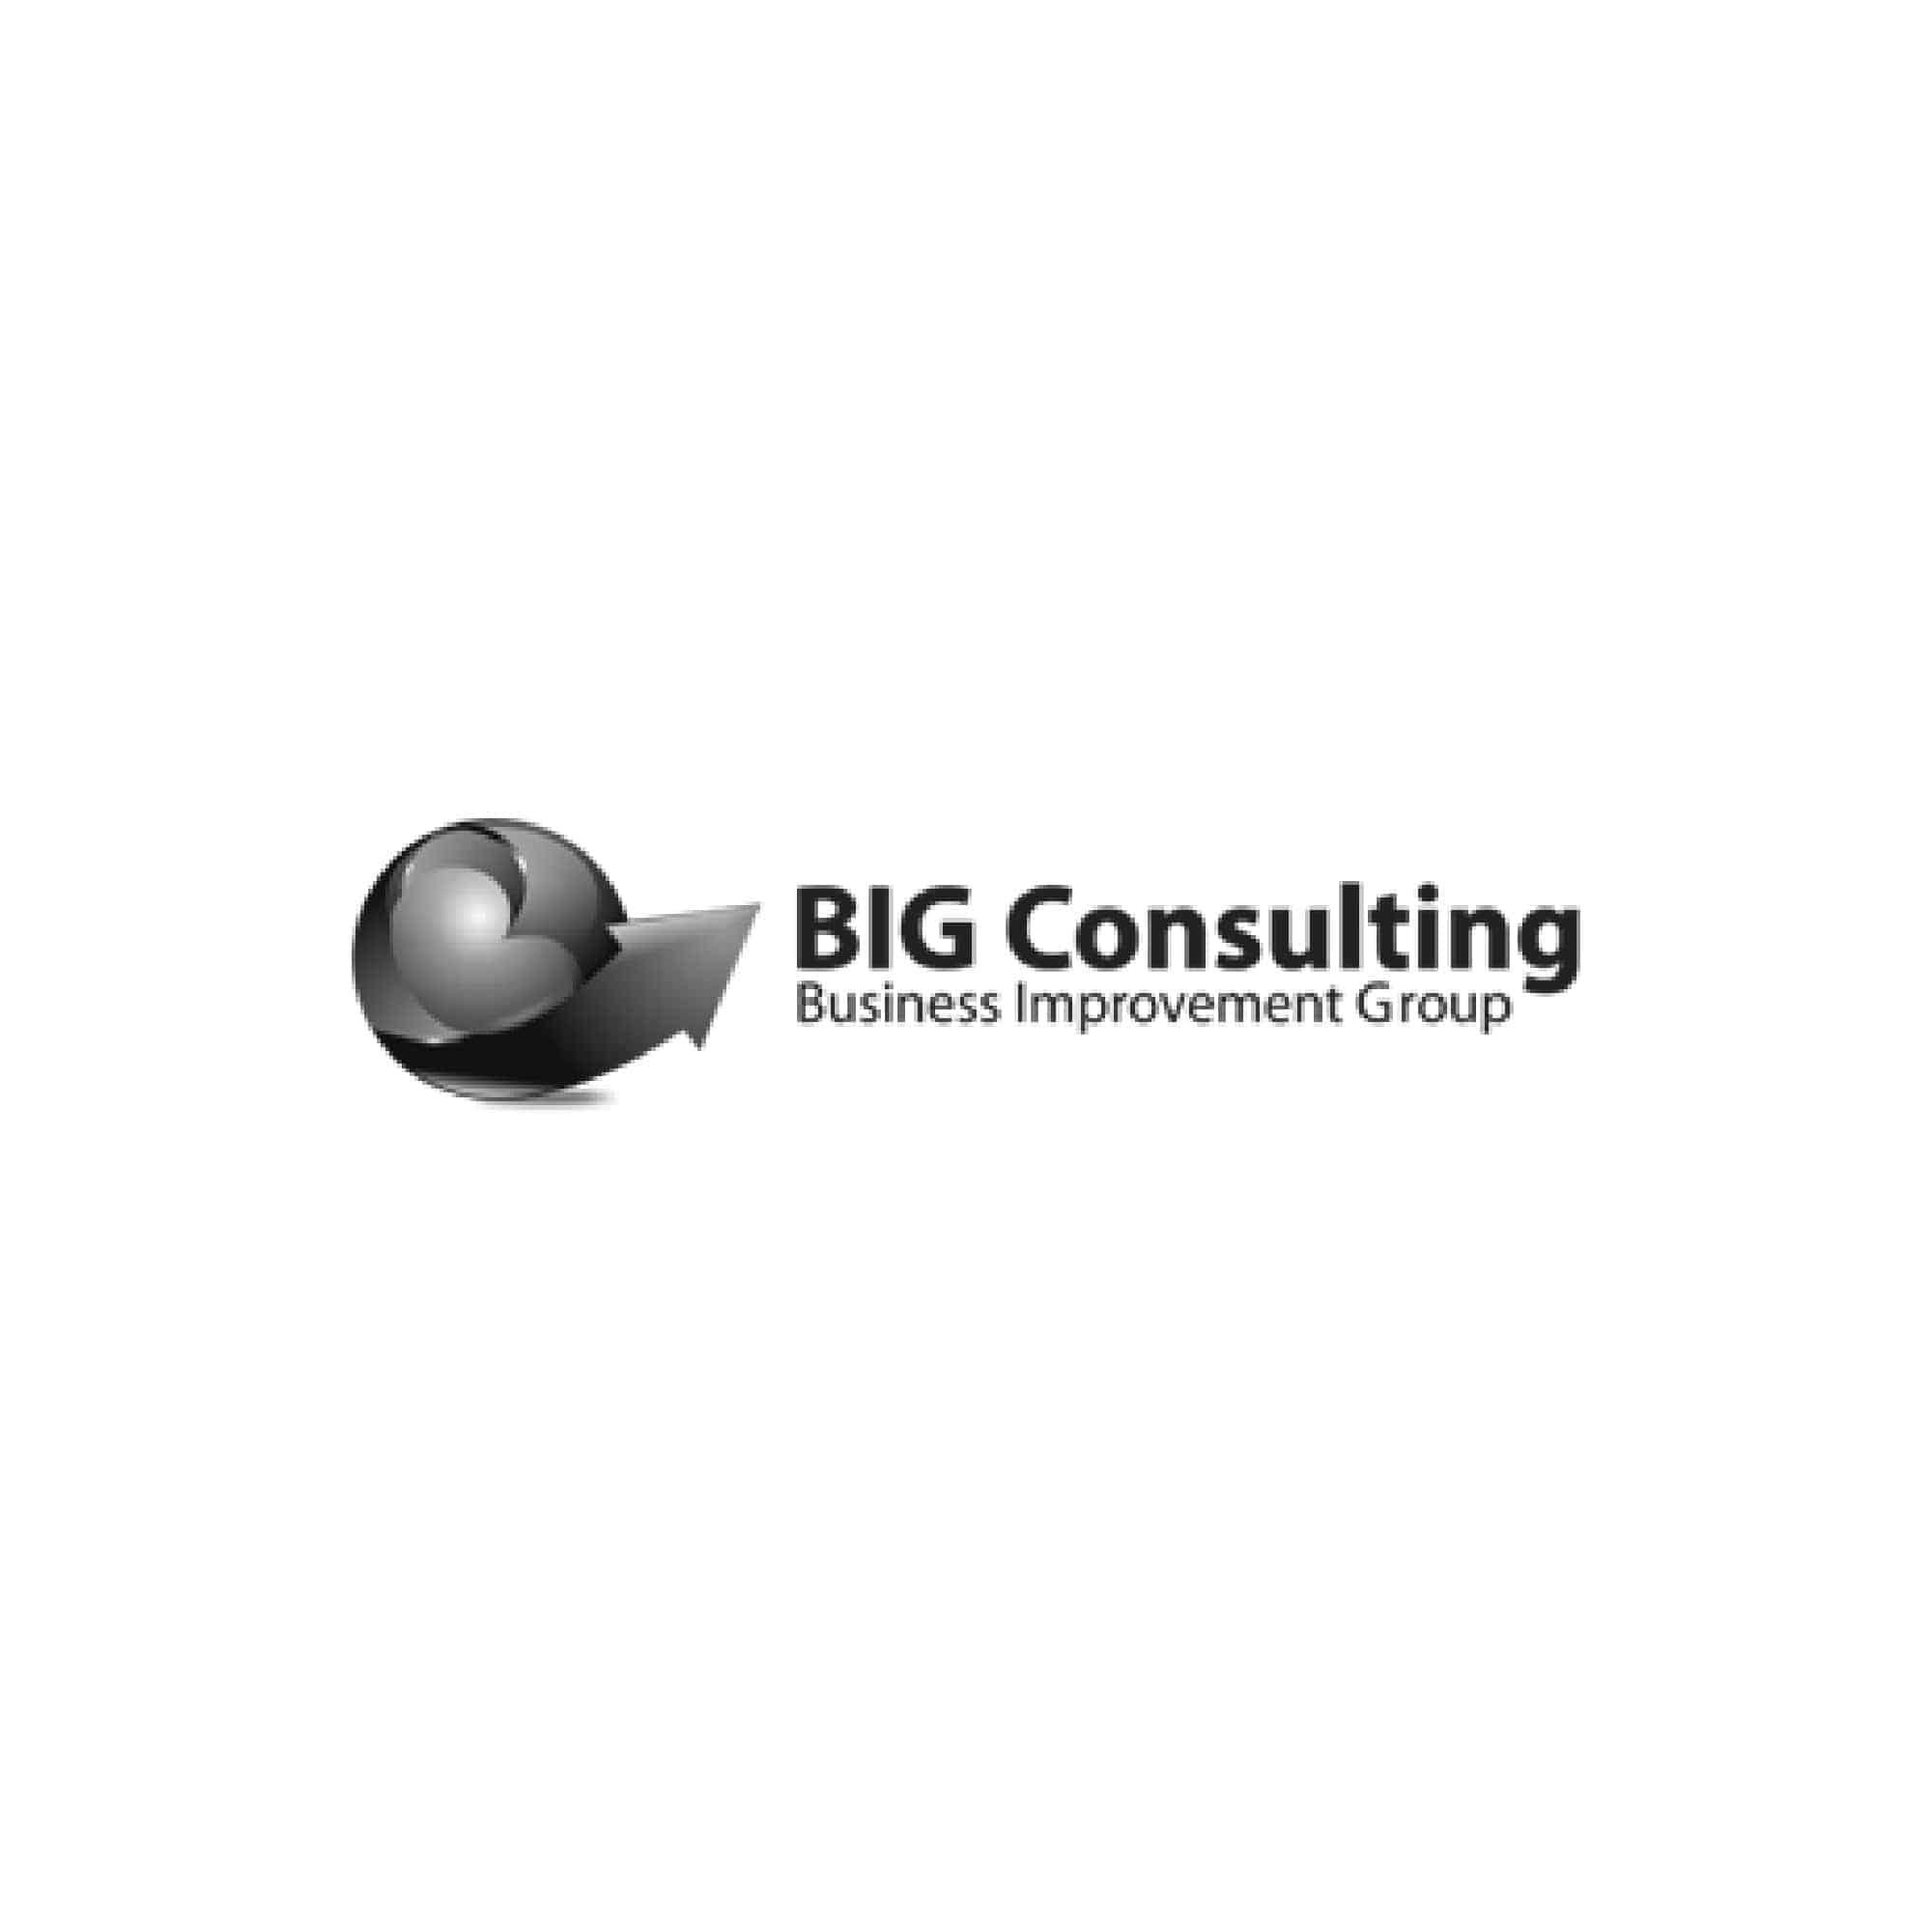 BIG consulting logo